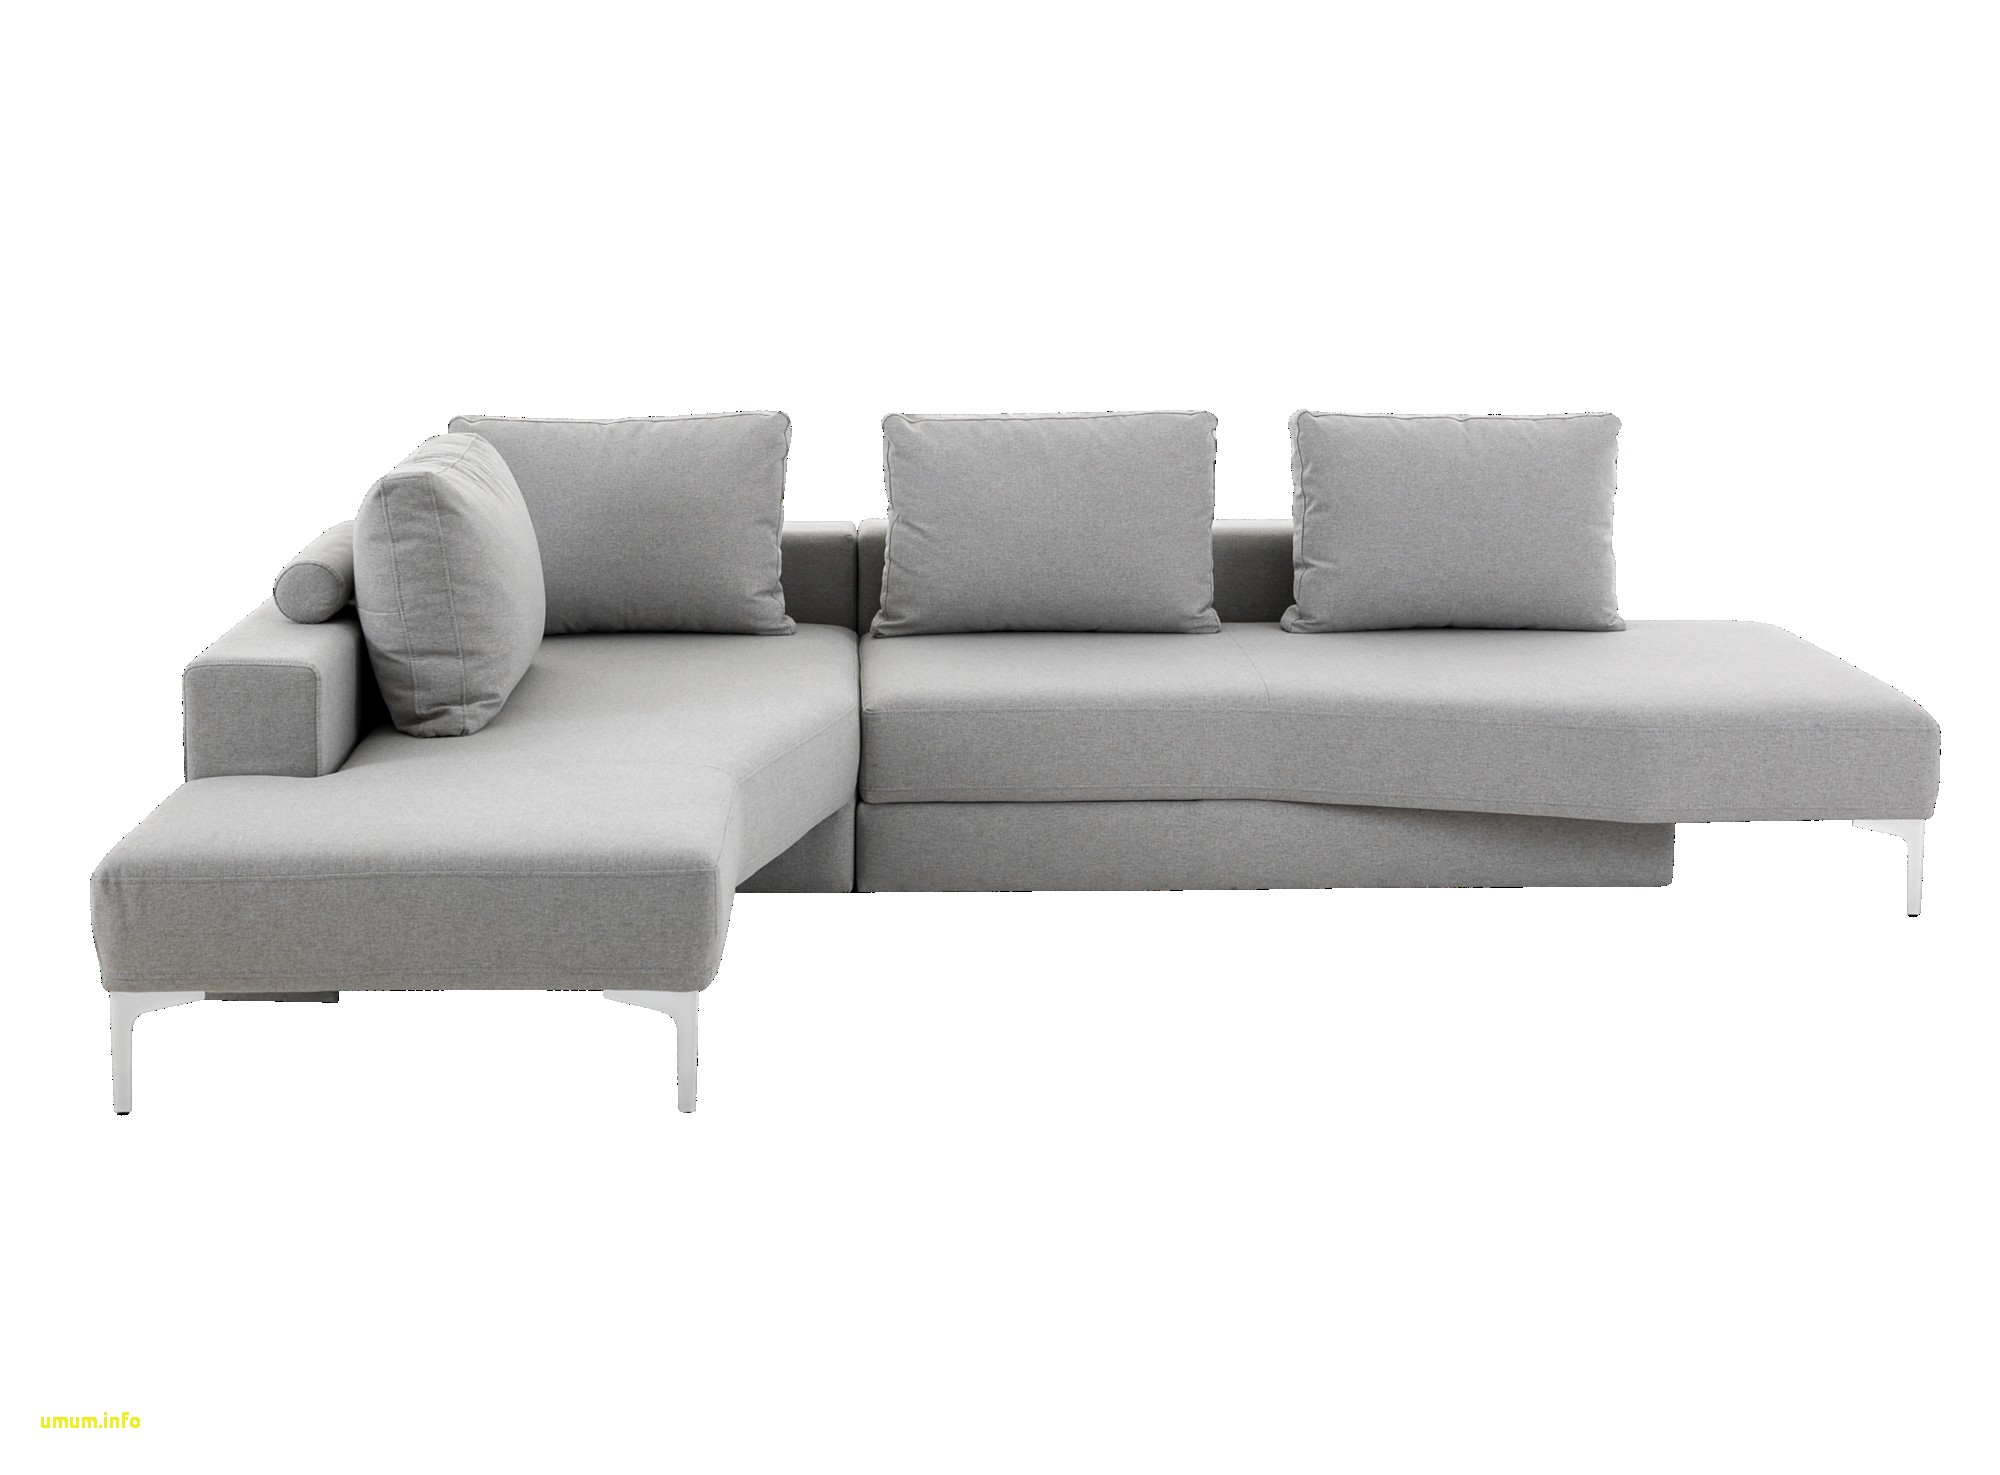 Ikea Canapé D Angle Convertible Impressionnant Photos Article with Tag Coussin Pour Meuble Exterieur